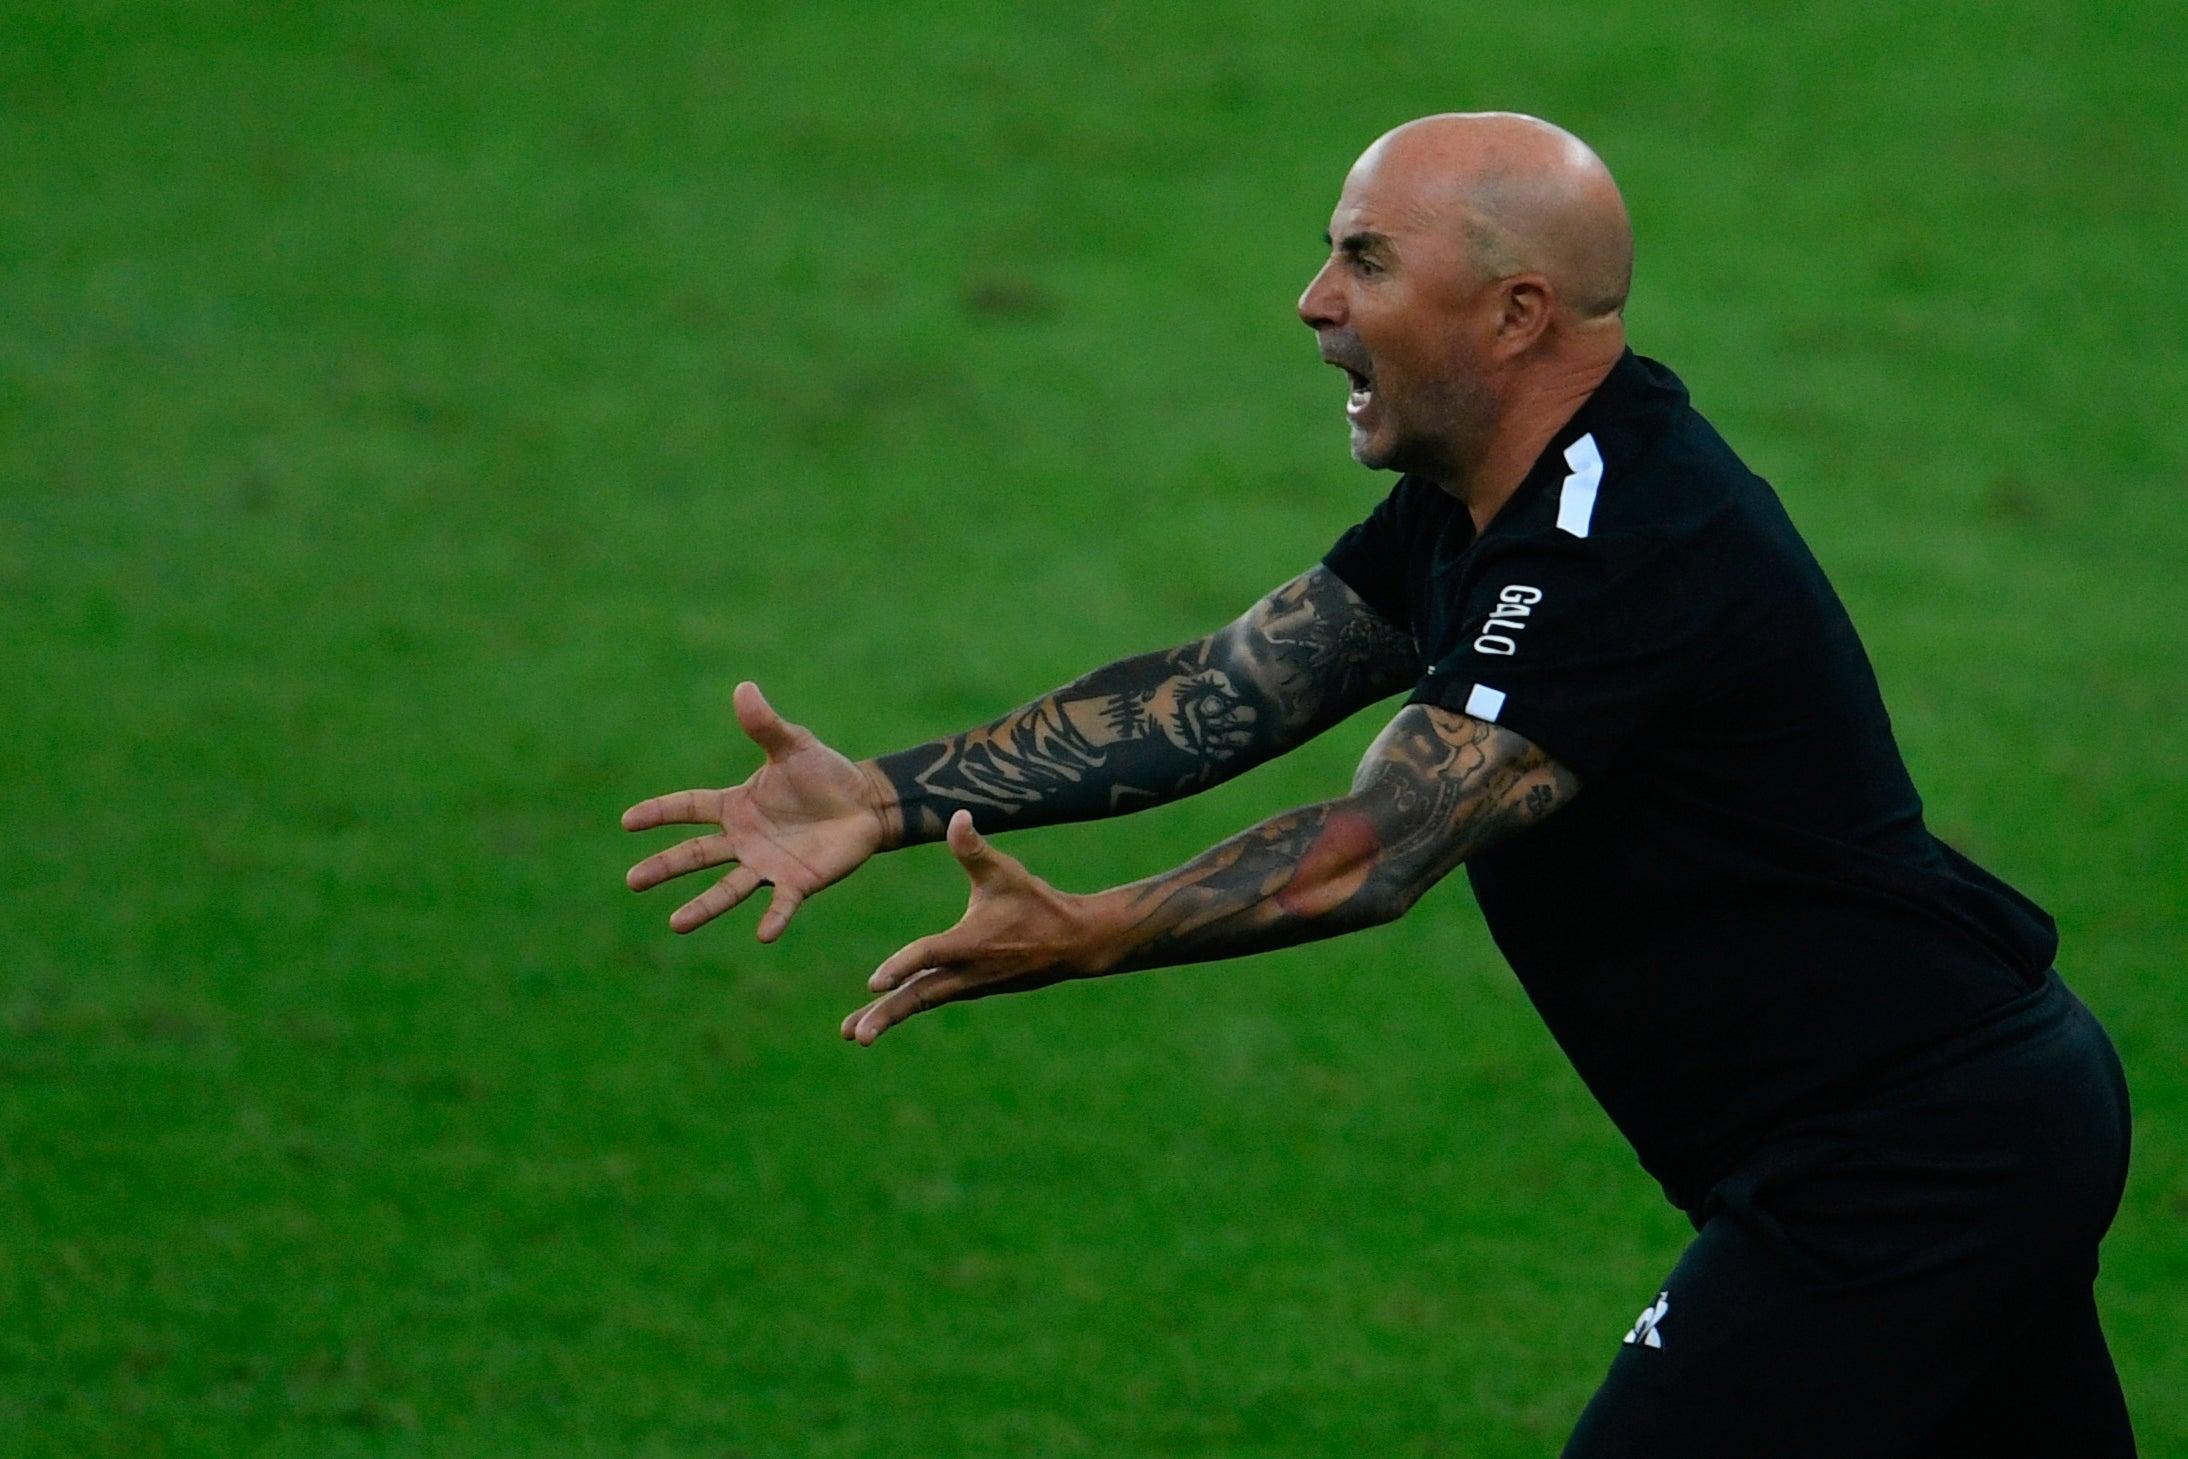 Jorge Sampaoli no seguirá al frente del Atlético Mineiro